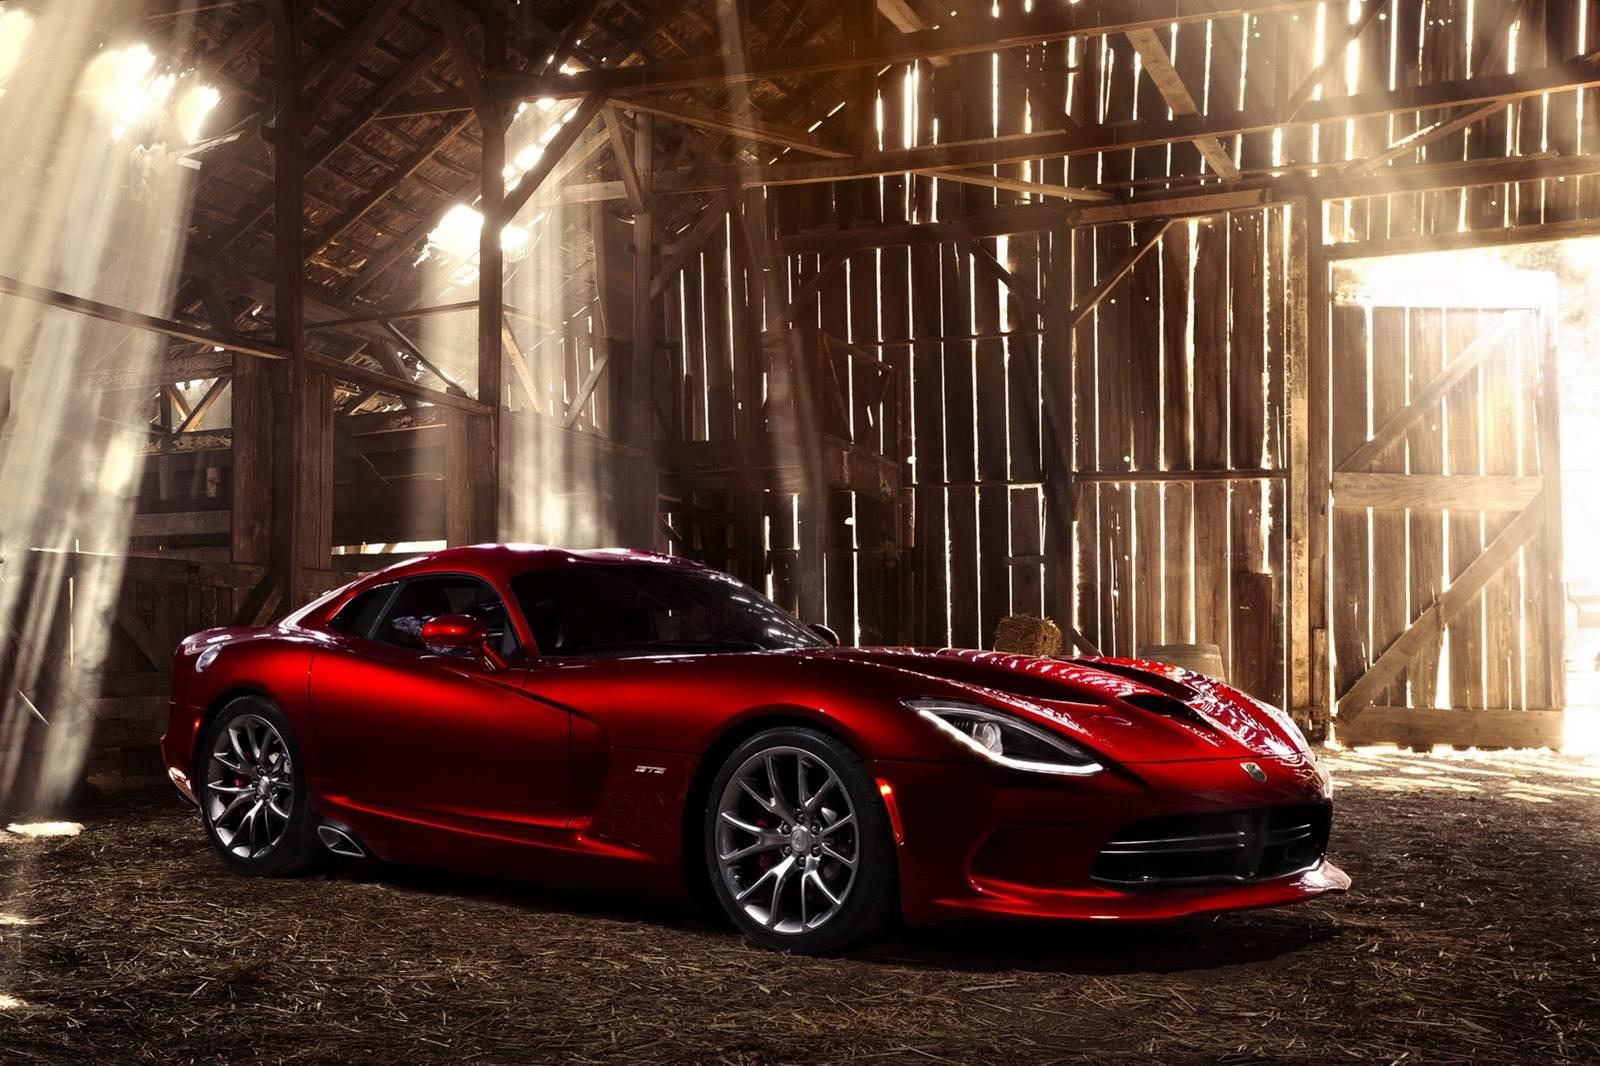 Srt Viper Price In India >> Srt Viper Gts Revealed Autocar India